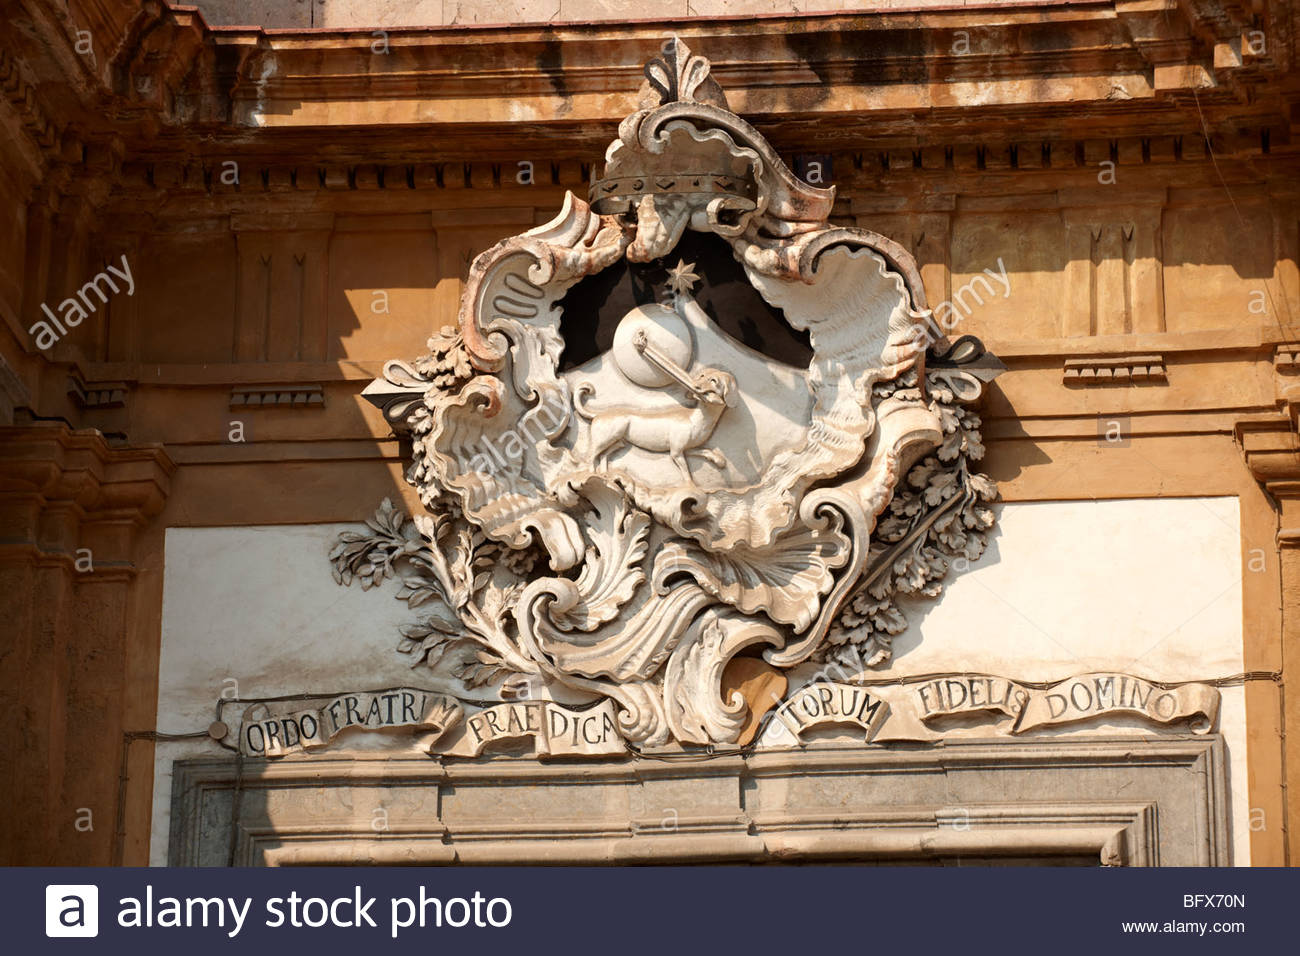 Baroque sculptures, architectural decoration, Palermo Sicily - Stock Image